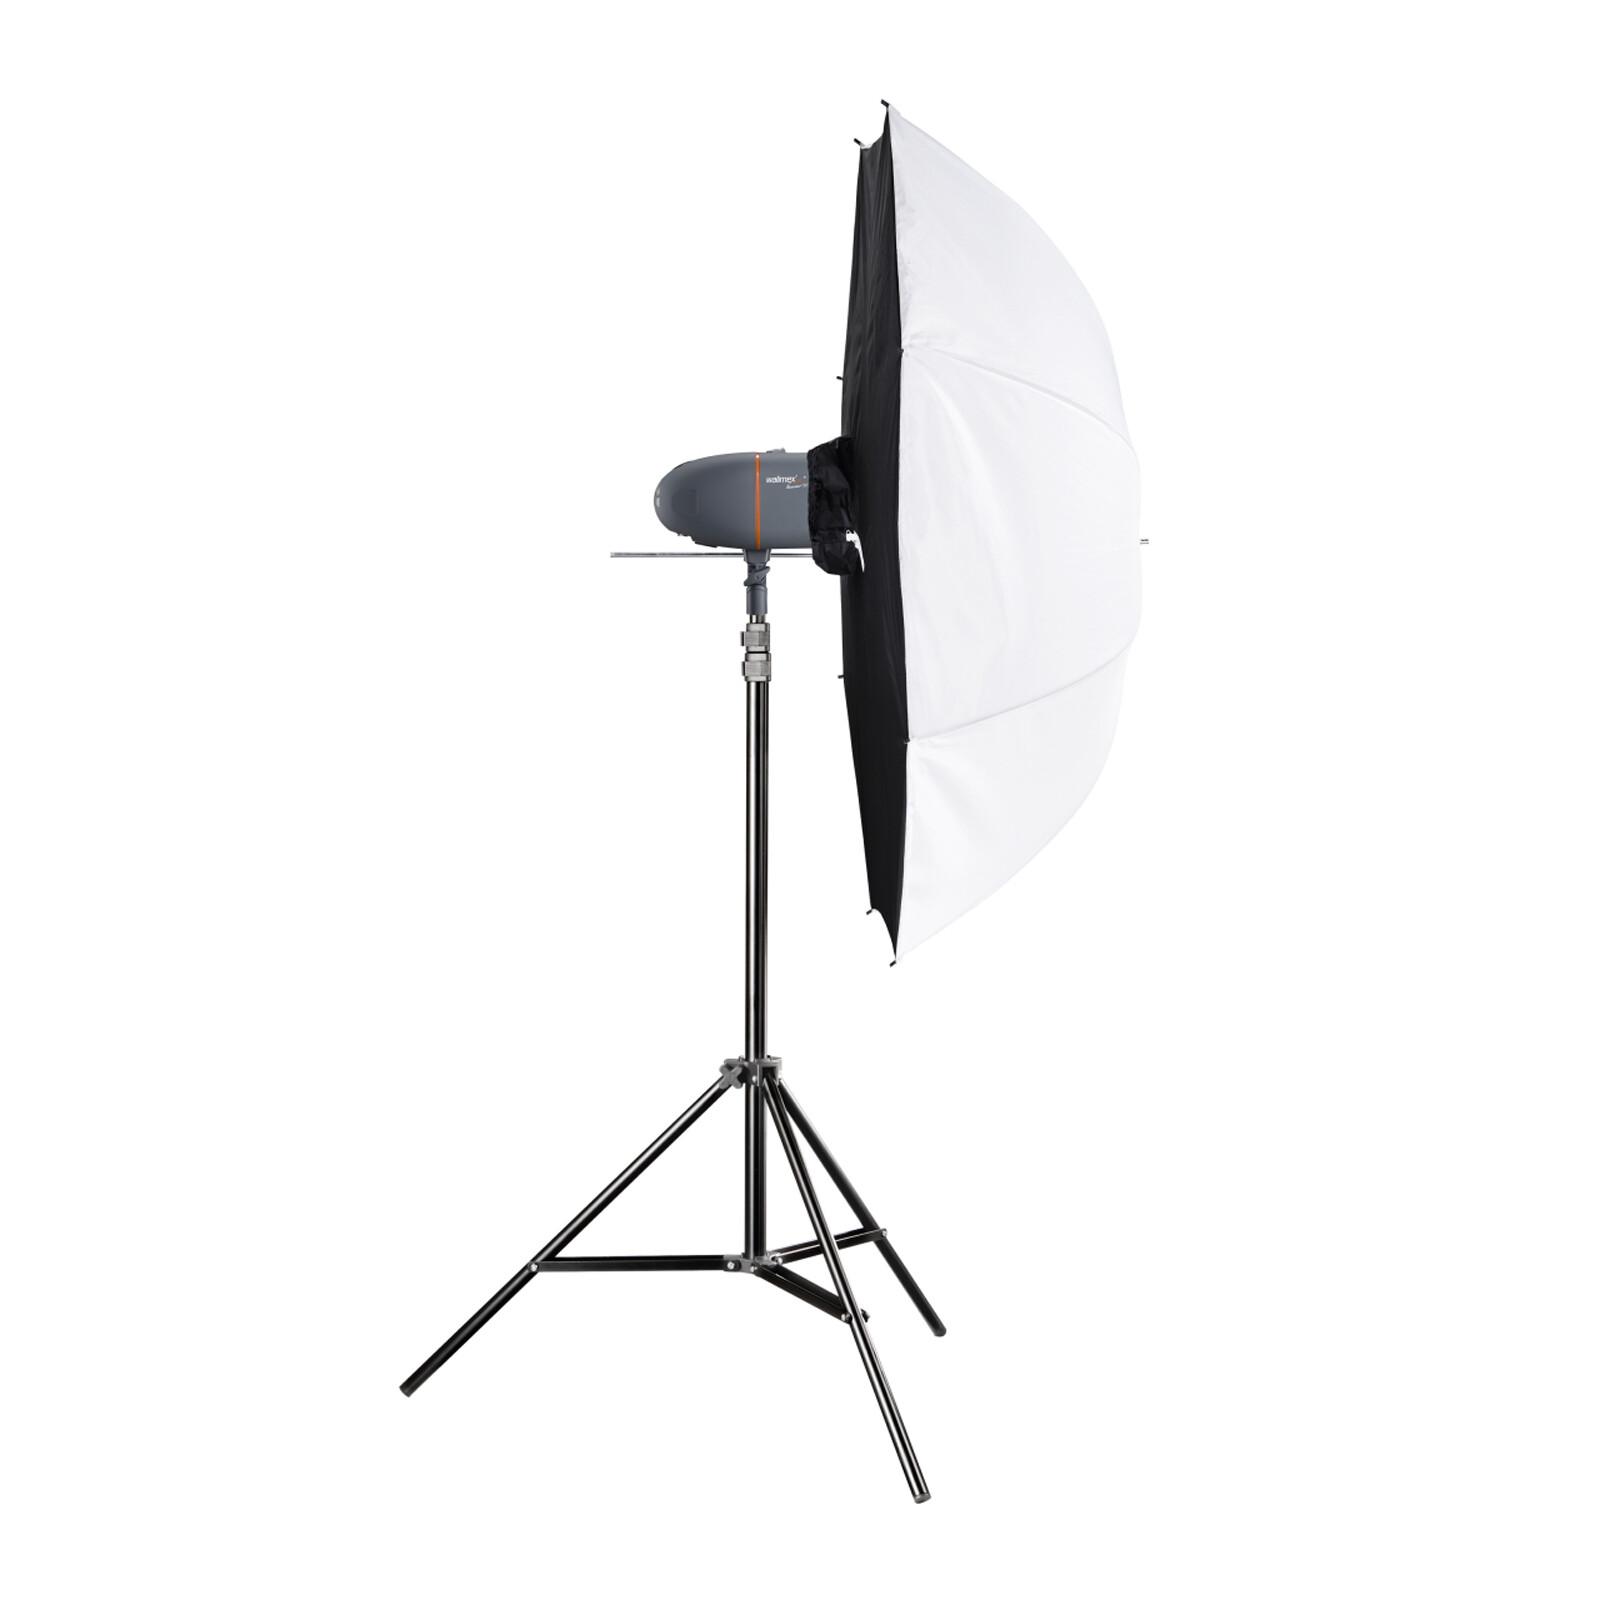 walimex pro Newcomer Studioset Mini 150